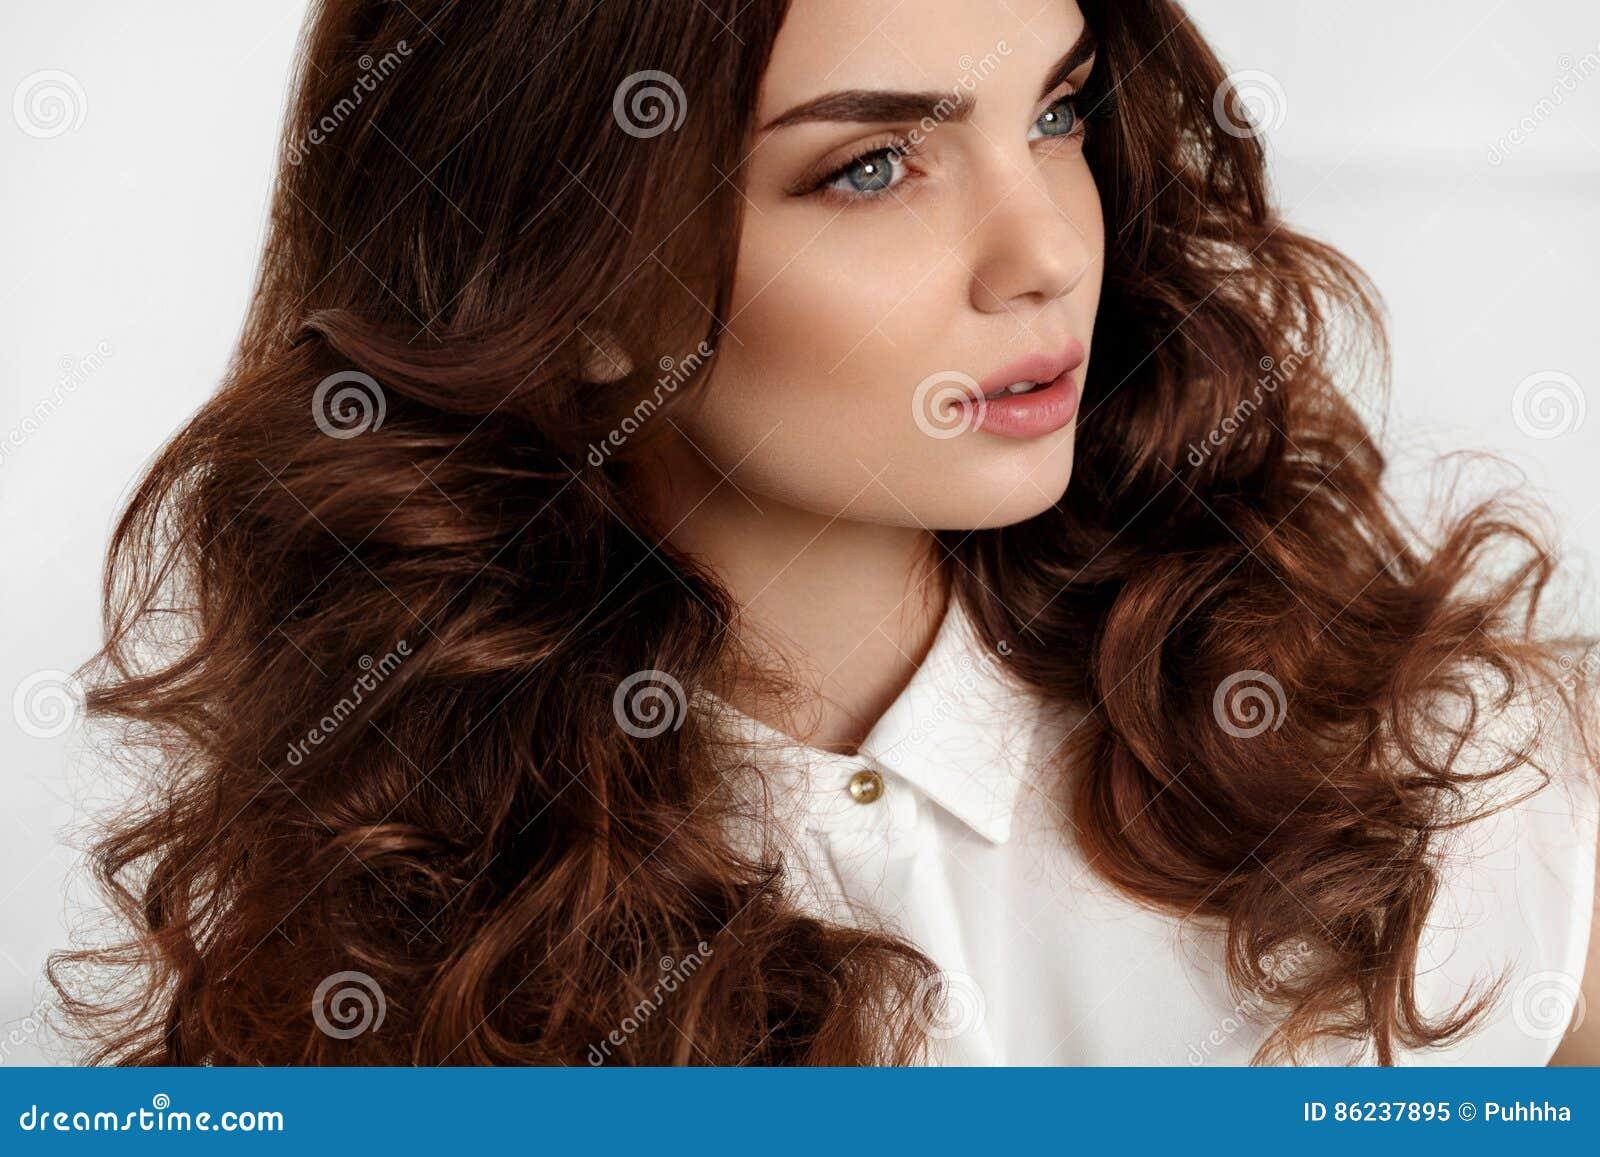 Het Mooie Kapsel Van Meisjes Modelwith Wavy Curly Bruine Haarkleur